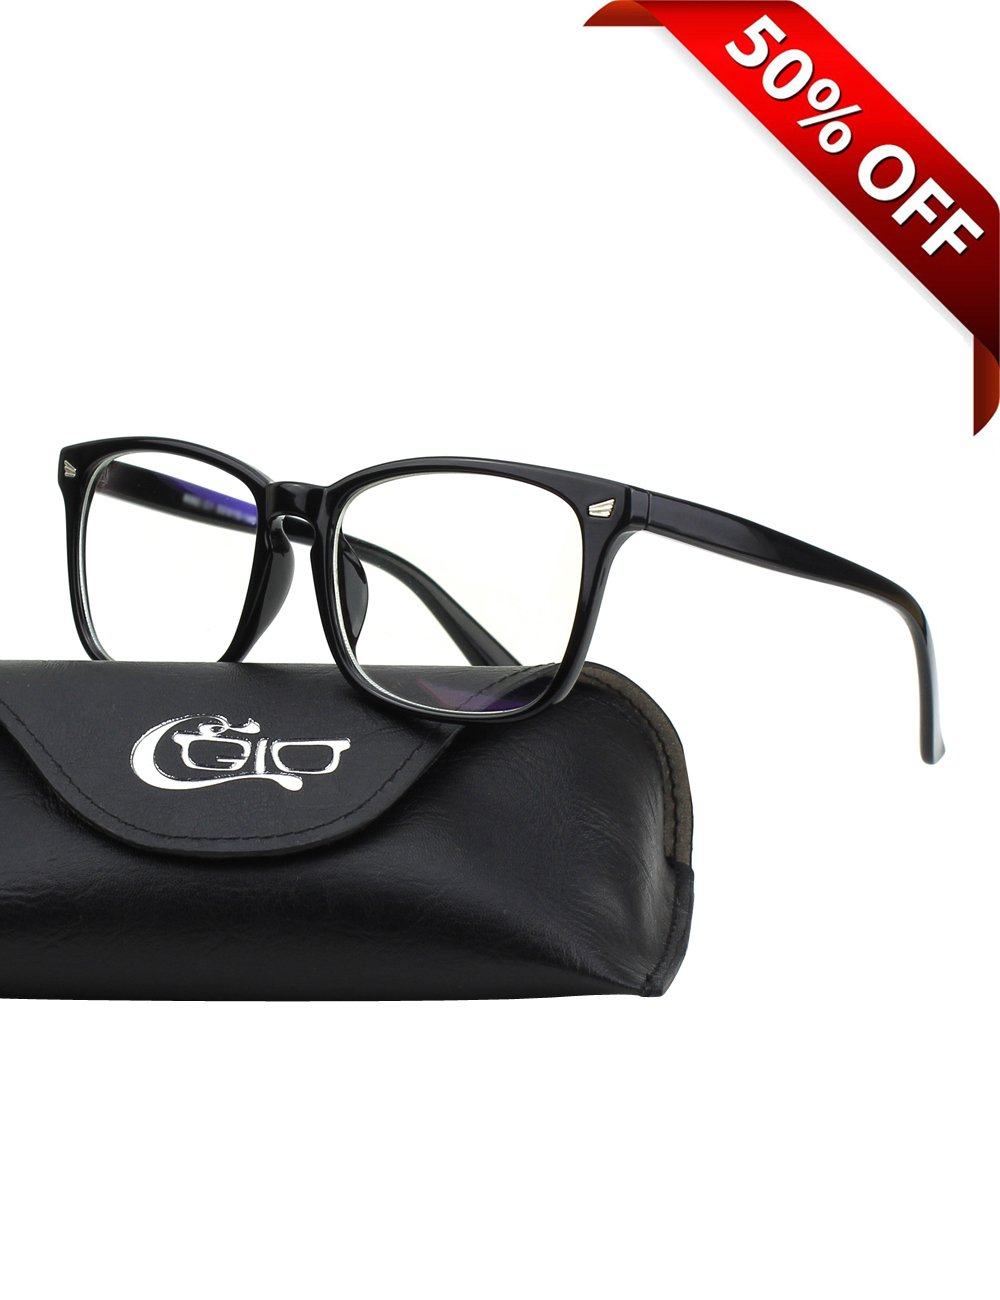 966f266325 Get Quotations · CGID CT82 Horn Oversized Blue Light Blocking Glasses